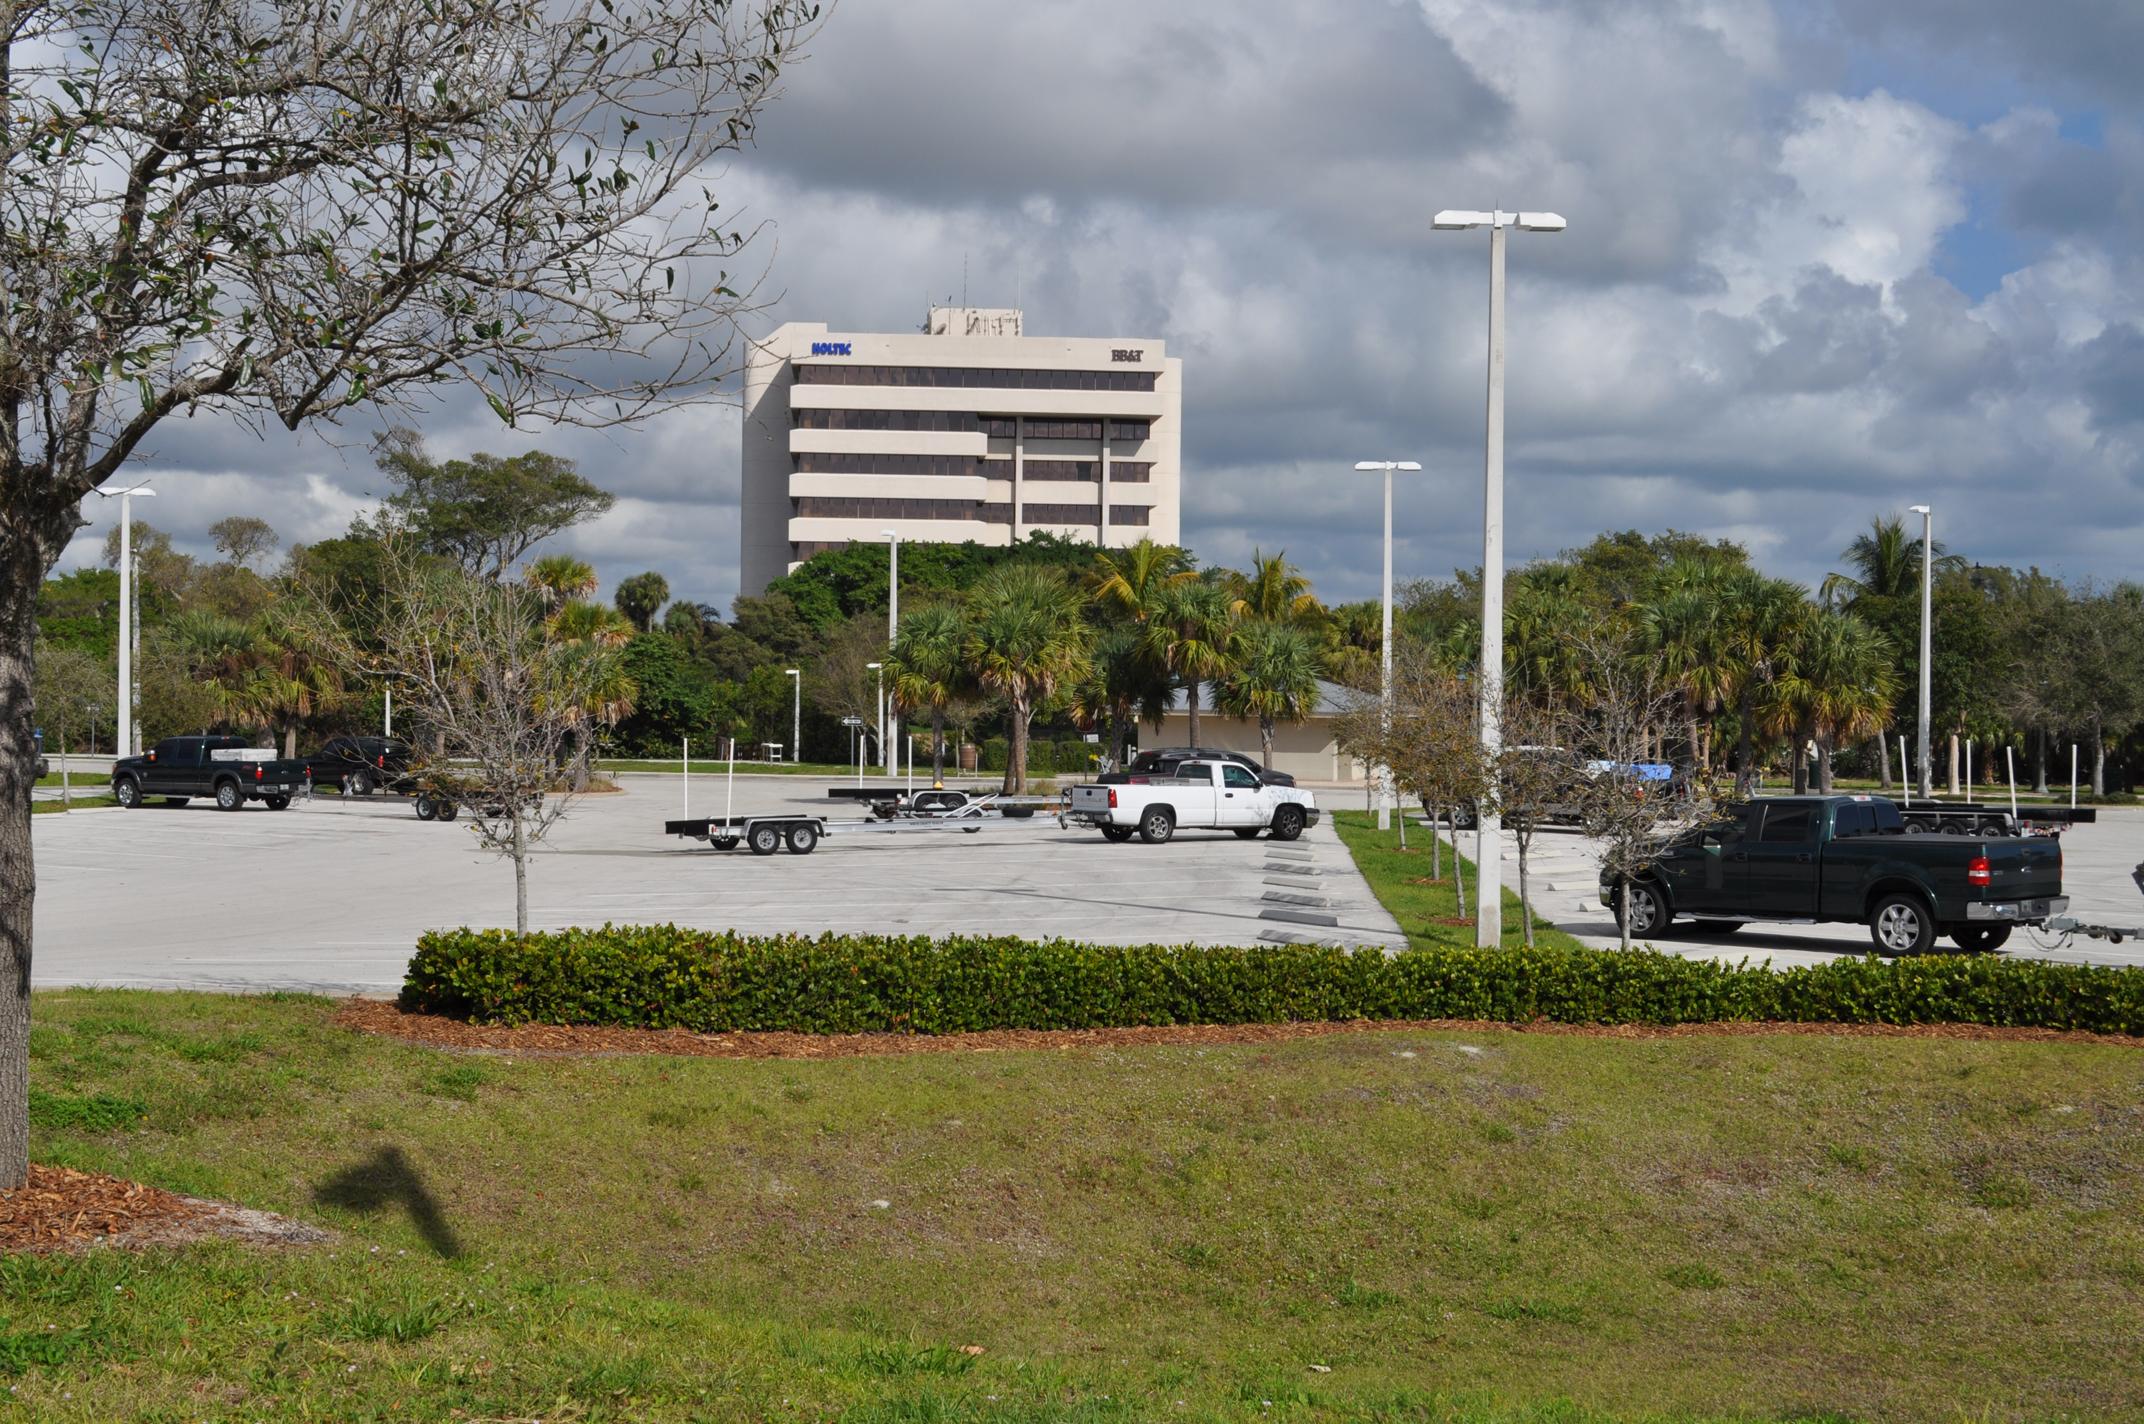 Burt Reynolds Park Palm Beach County Florida Trailer Parking.JPG